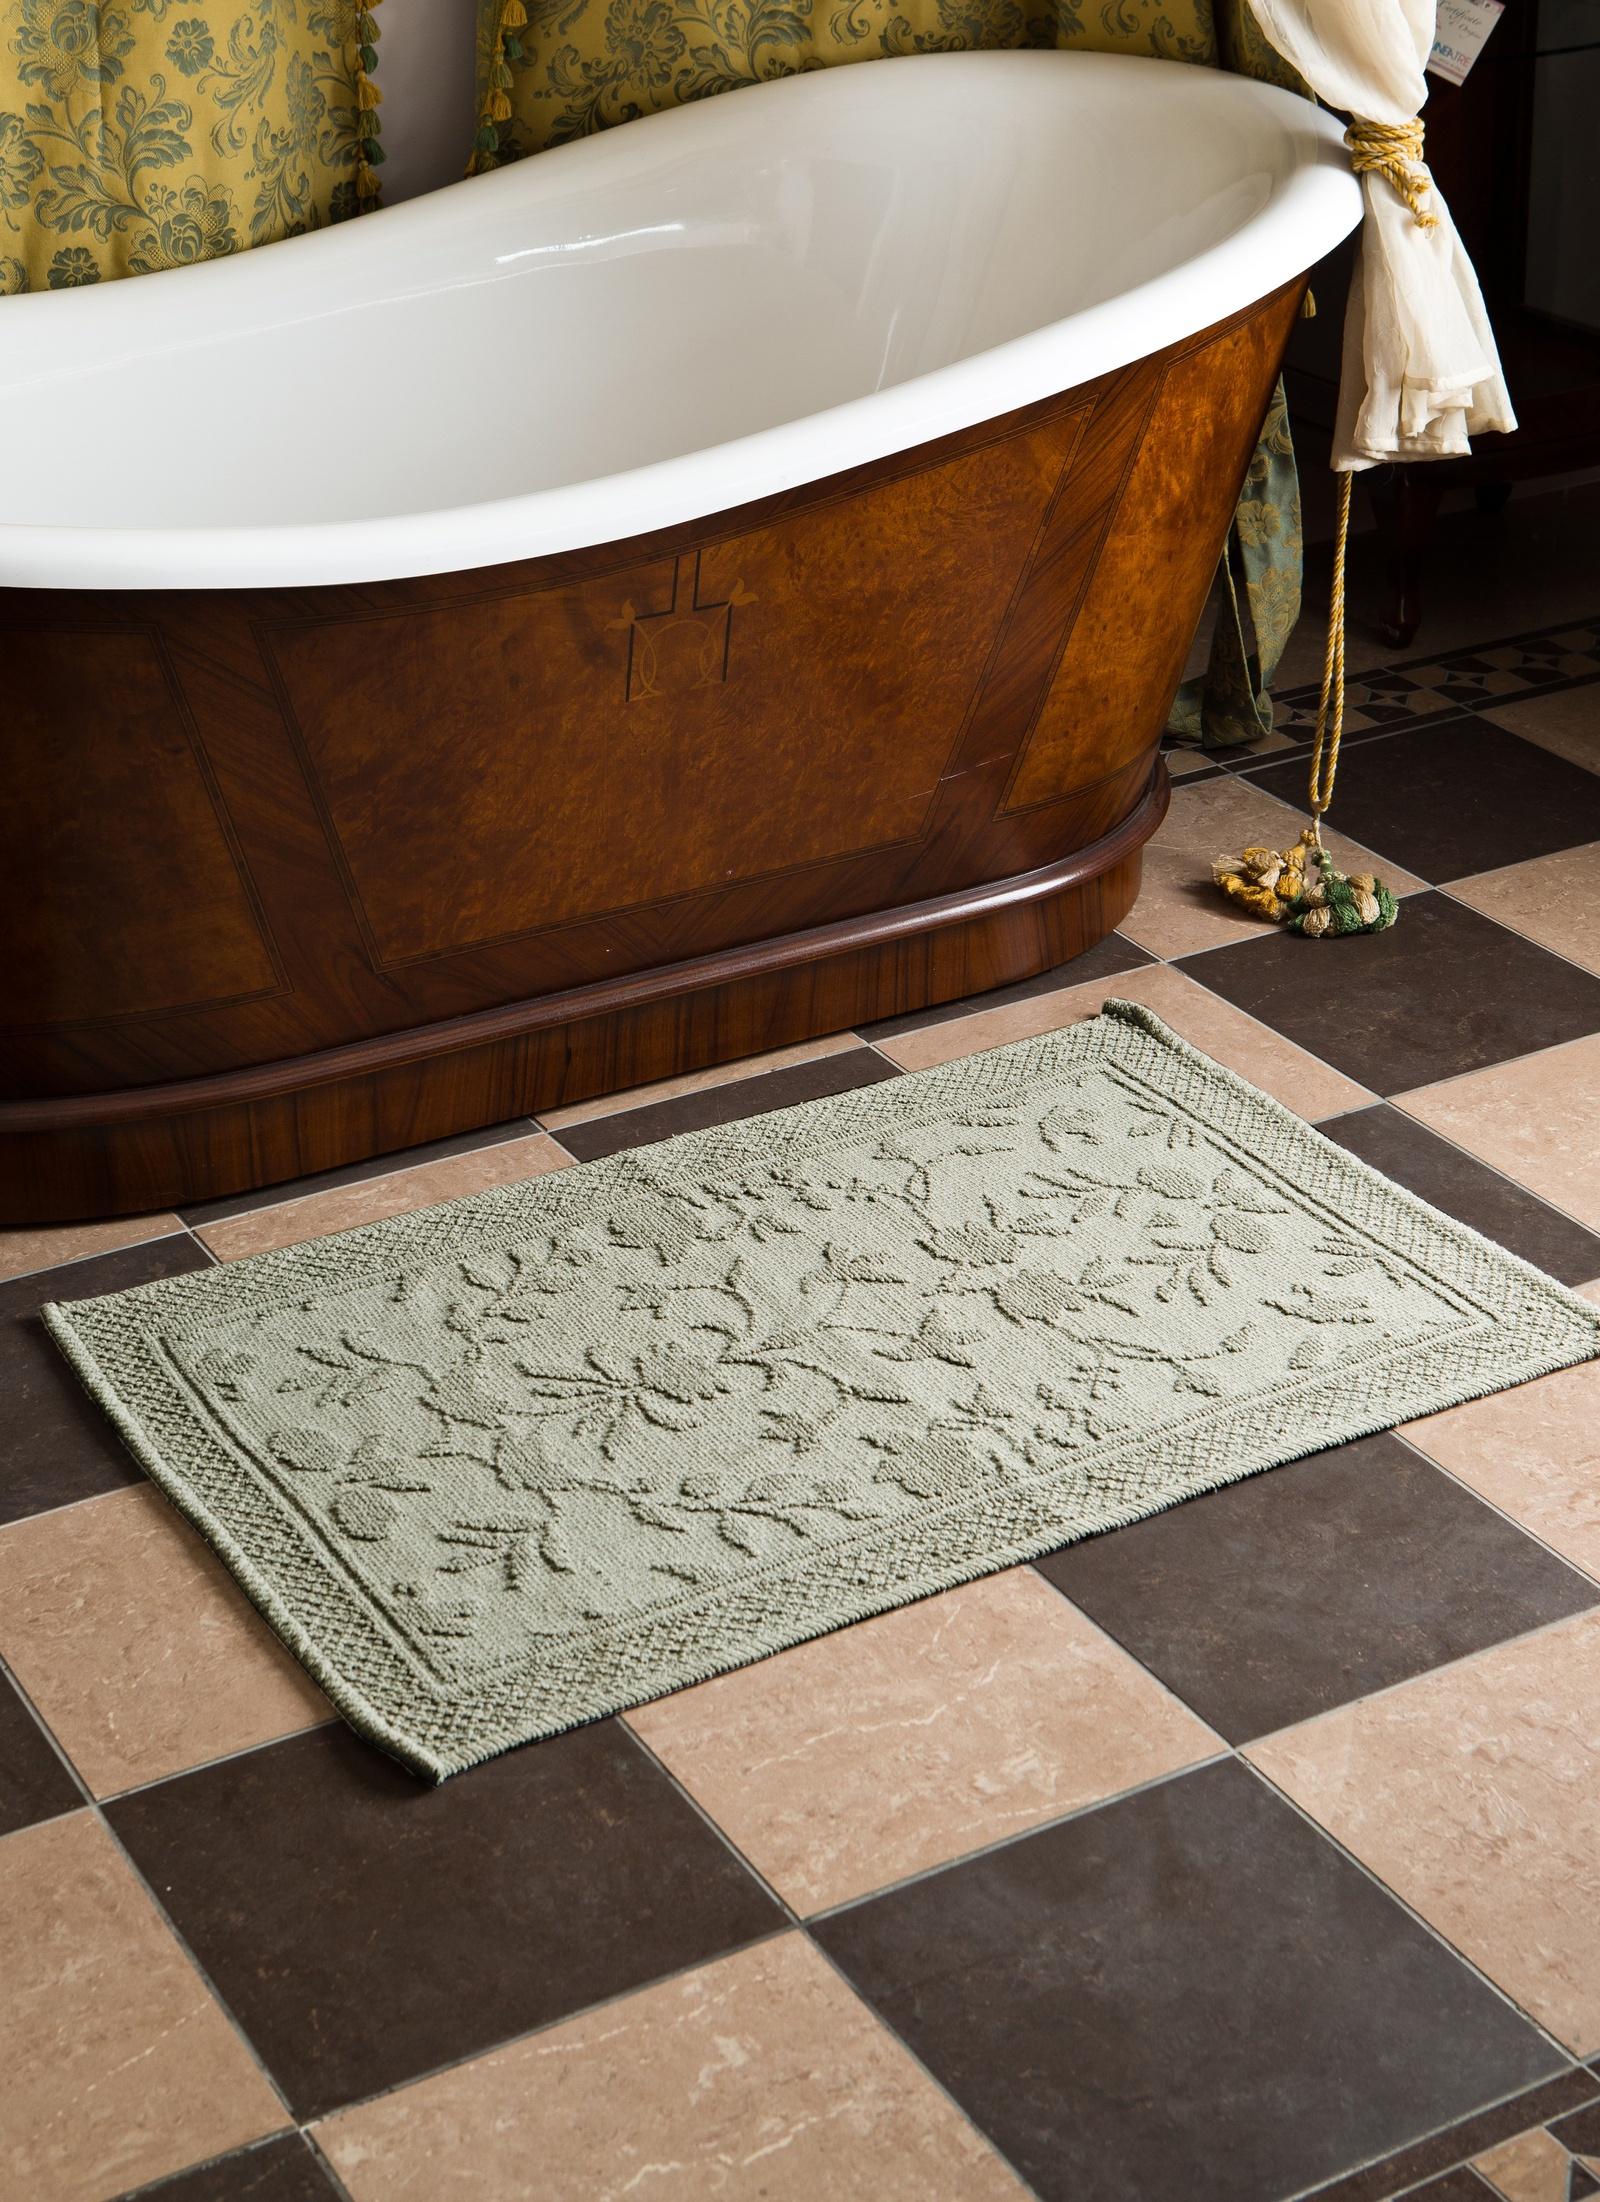 Фото - Коврик для ванной Arloni Коврик Кармен (сафари) 60*90 arloni коврик самотканный для ванной